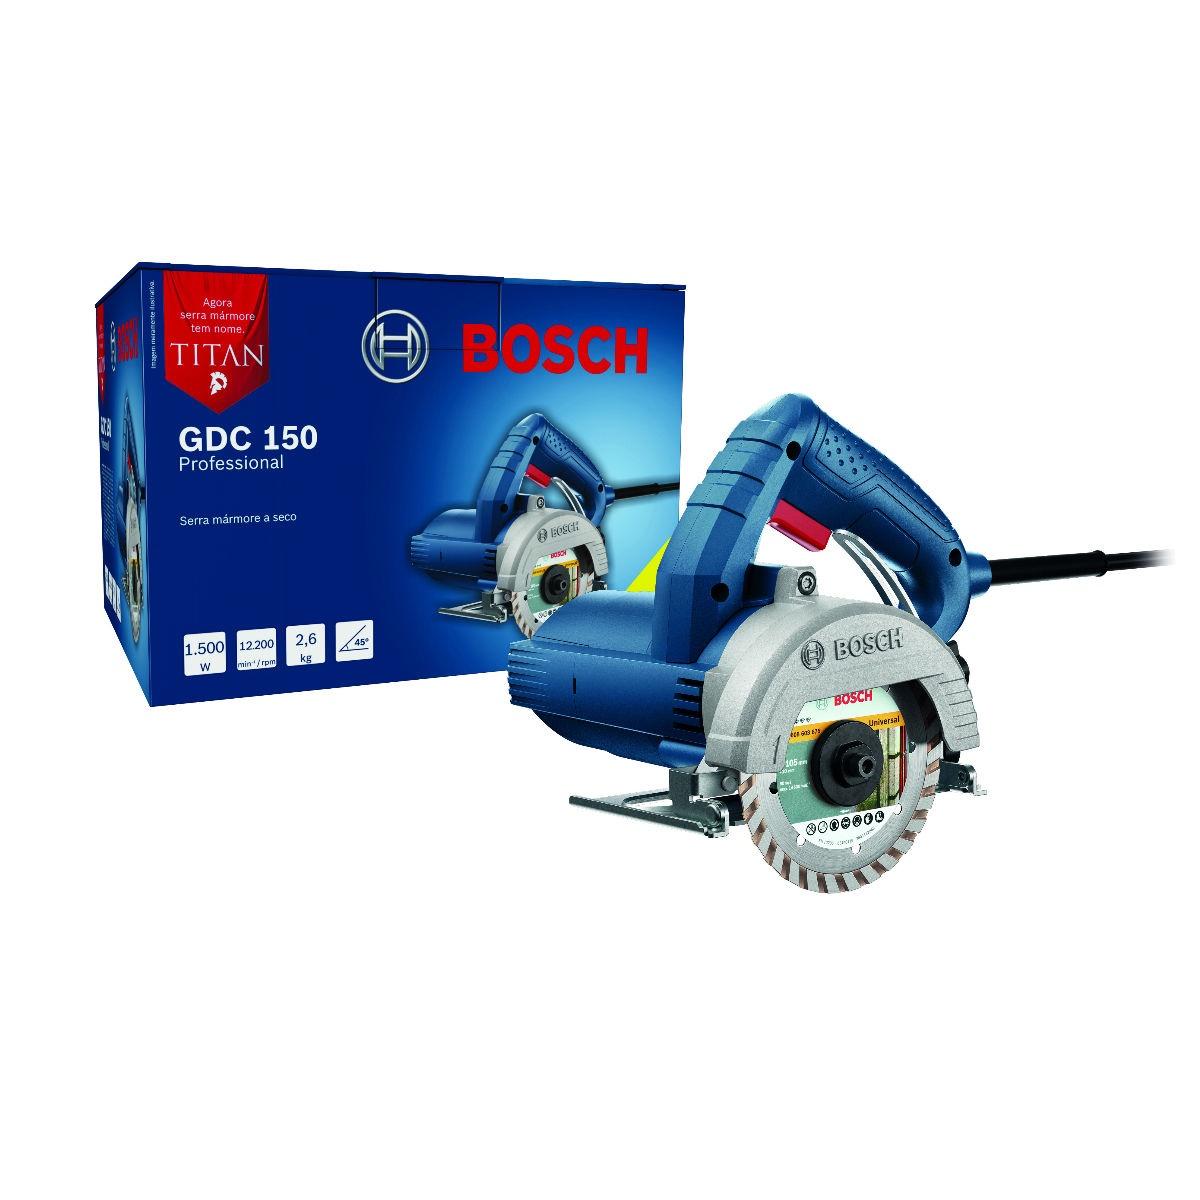 Serra Mármore Bosch Titan 1500W Disco 125mm Professional GDC 150 - 127V